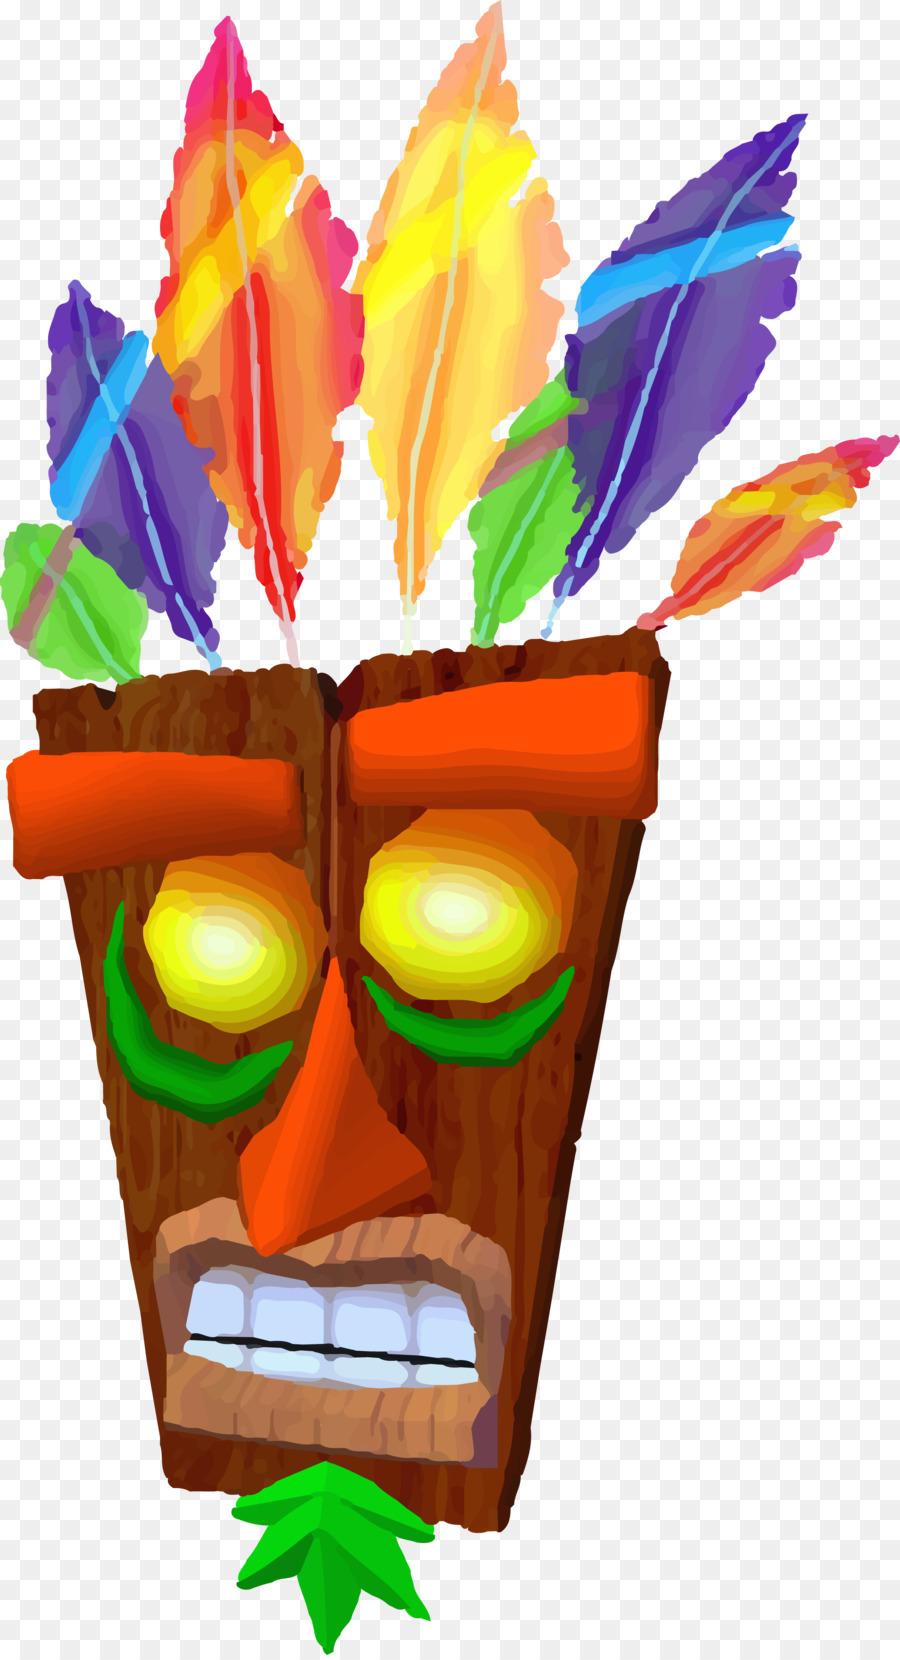 crash bandicoot aku aku png clipart Crash Bandicoot N. Sane.